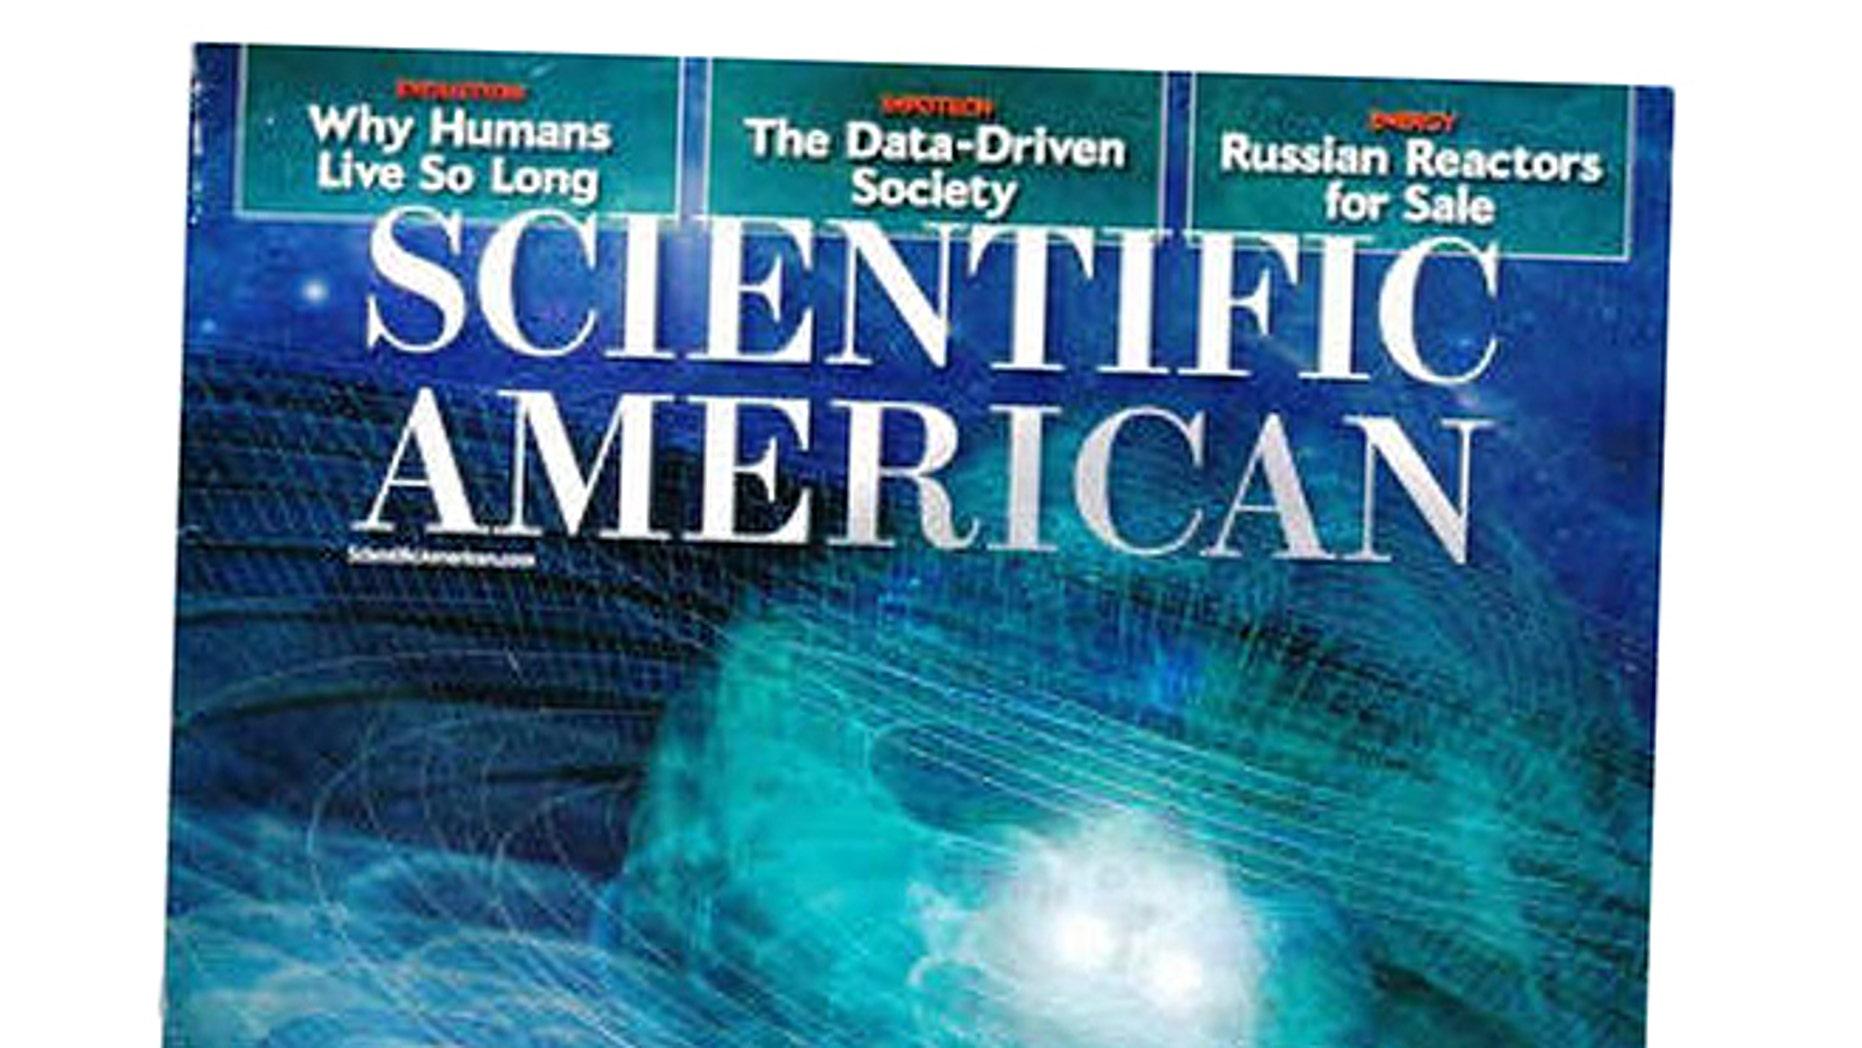 The Oct. 2013 issue of Scientific American magazine.